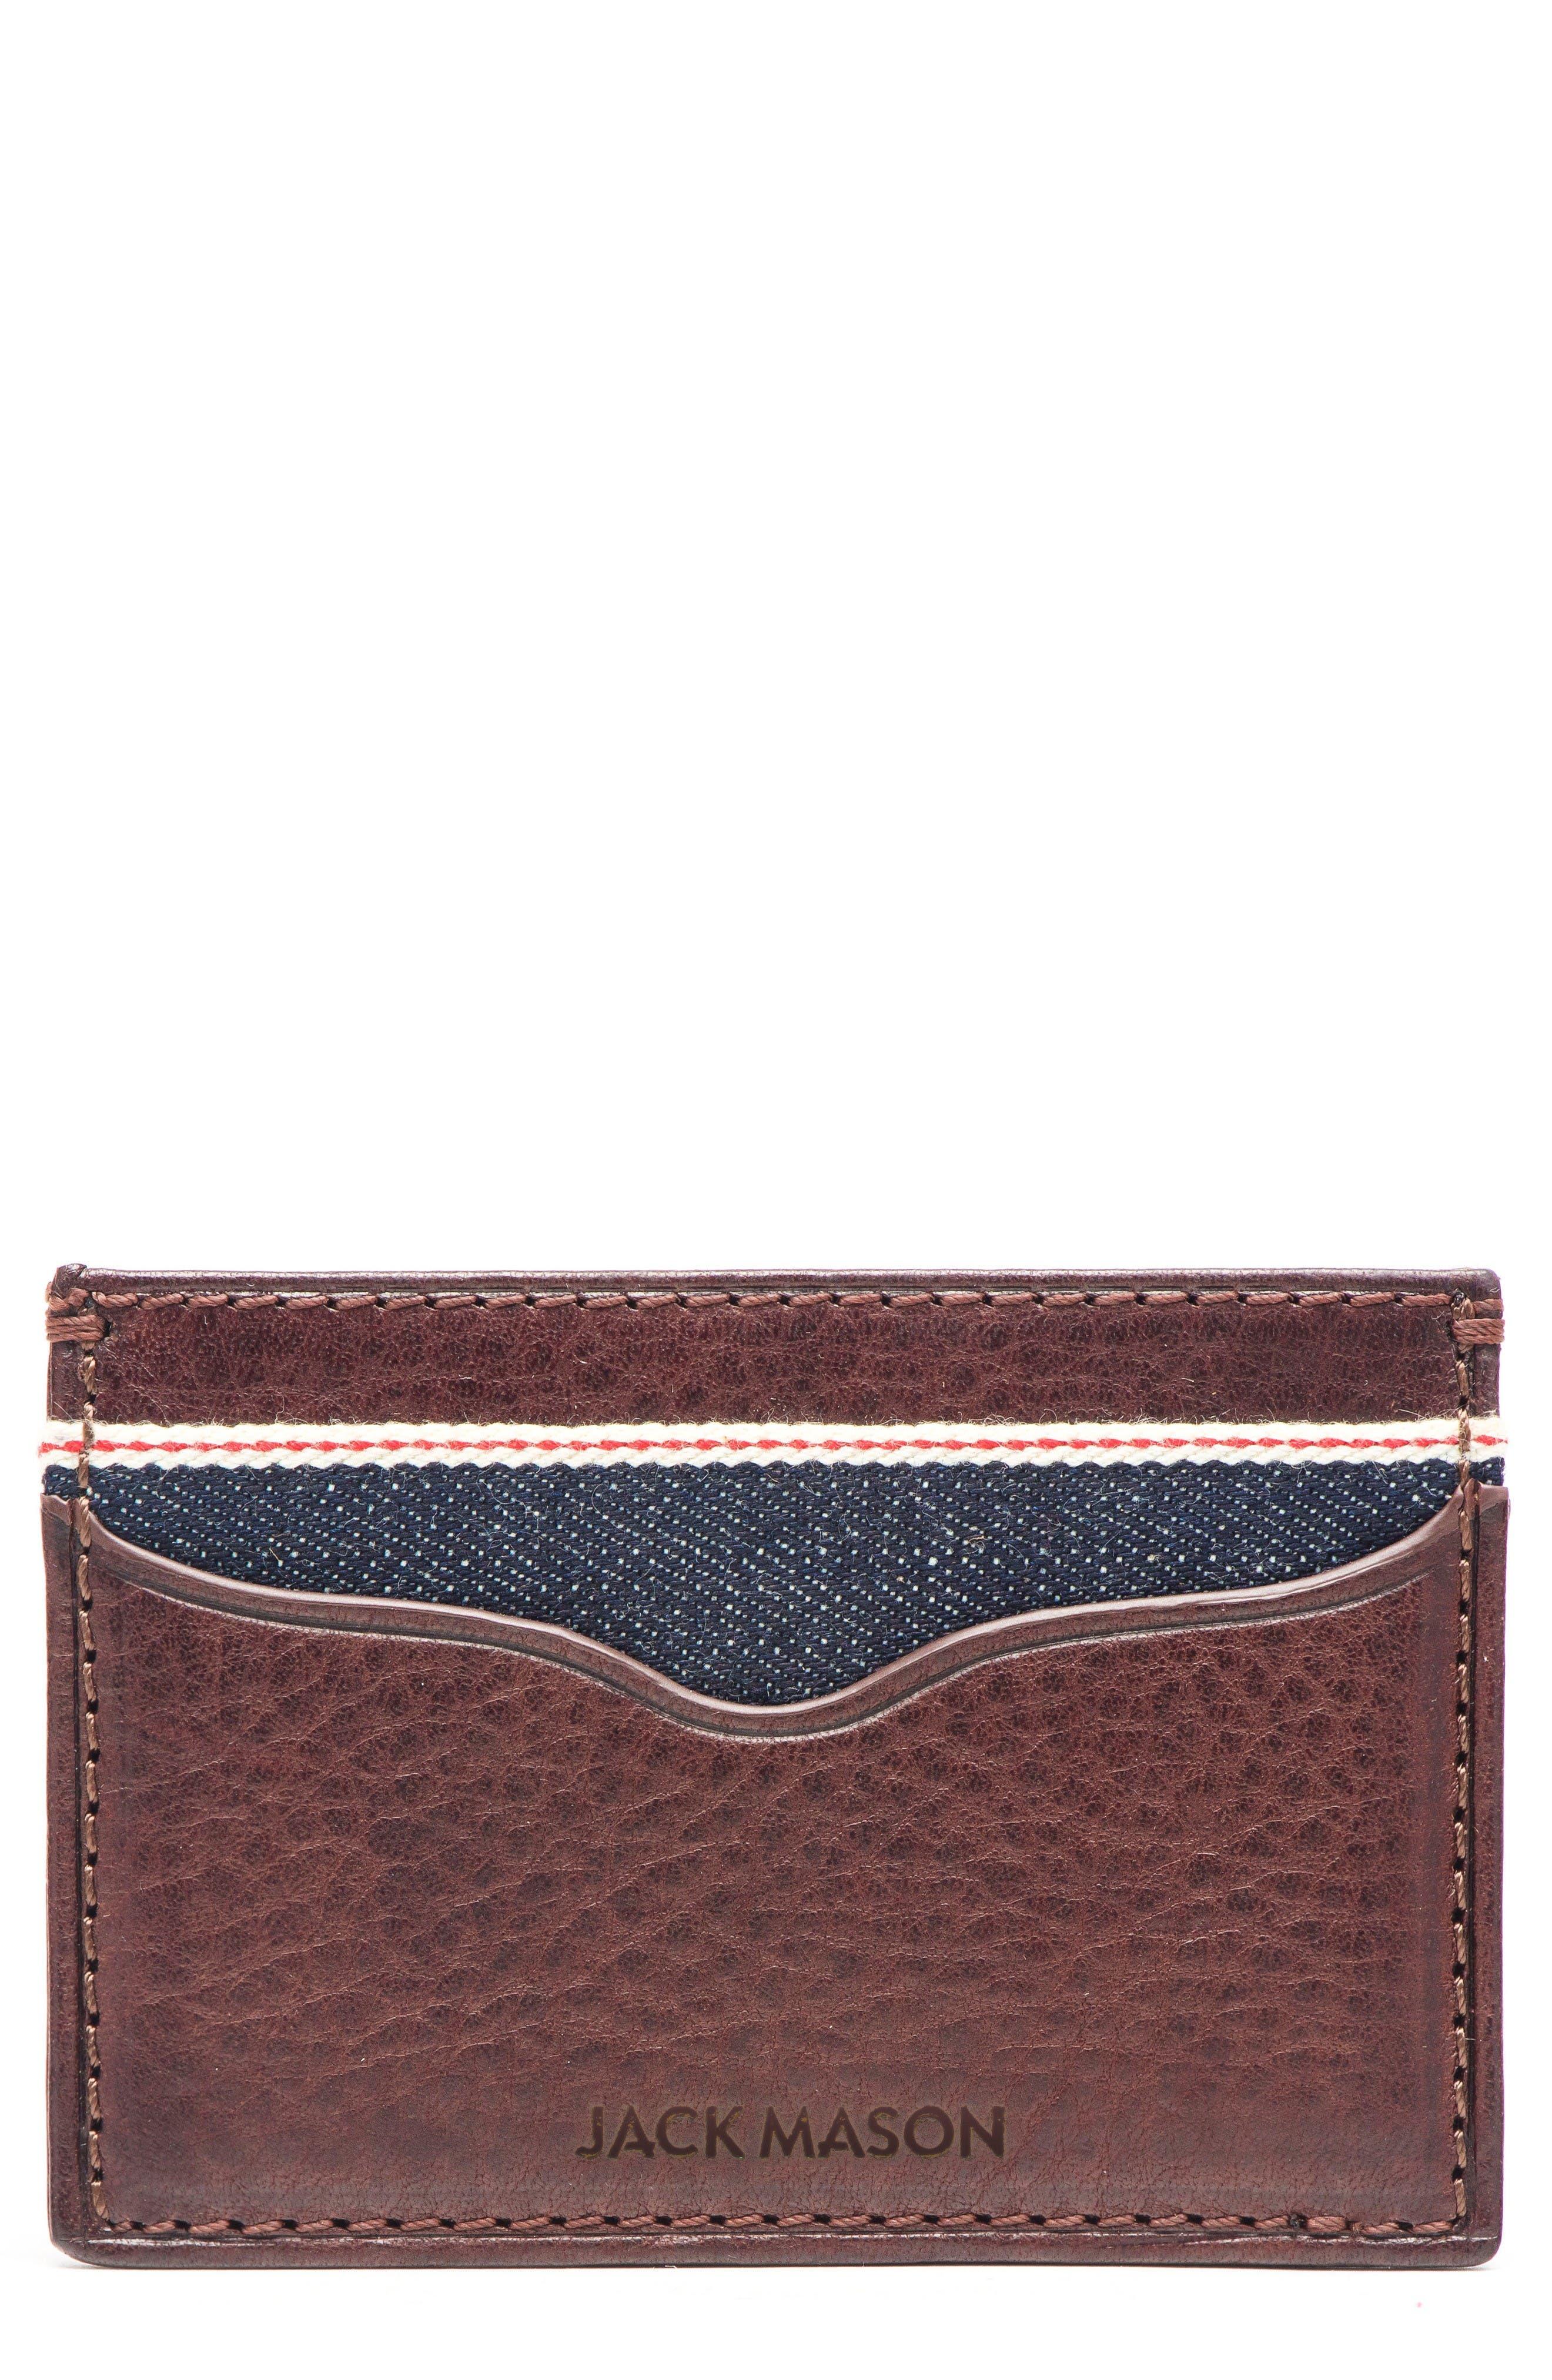 Jack Mason Leather & Denim Card Case